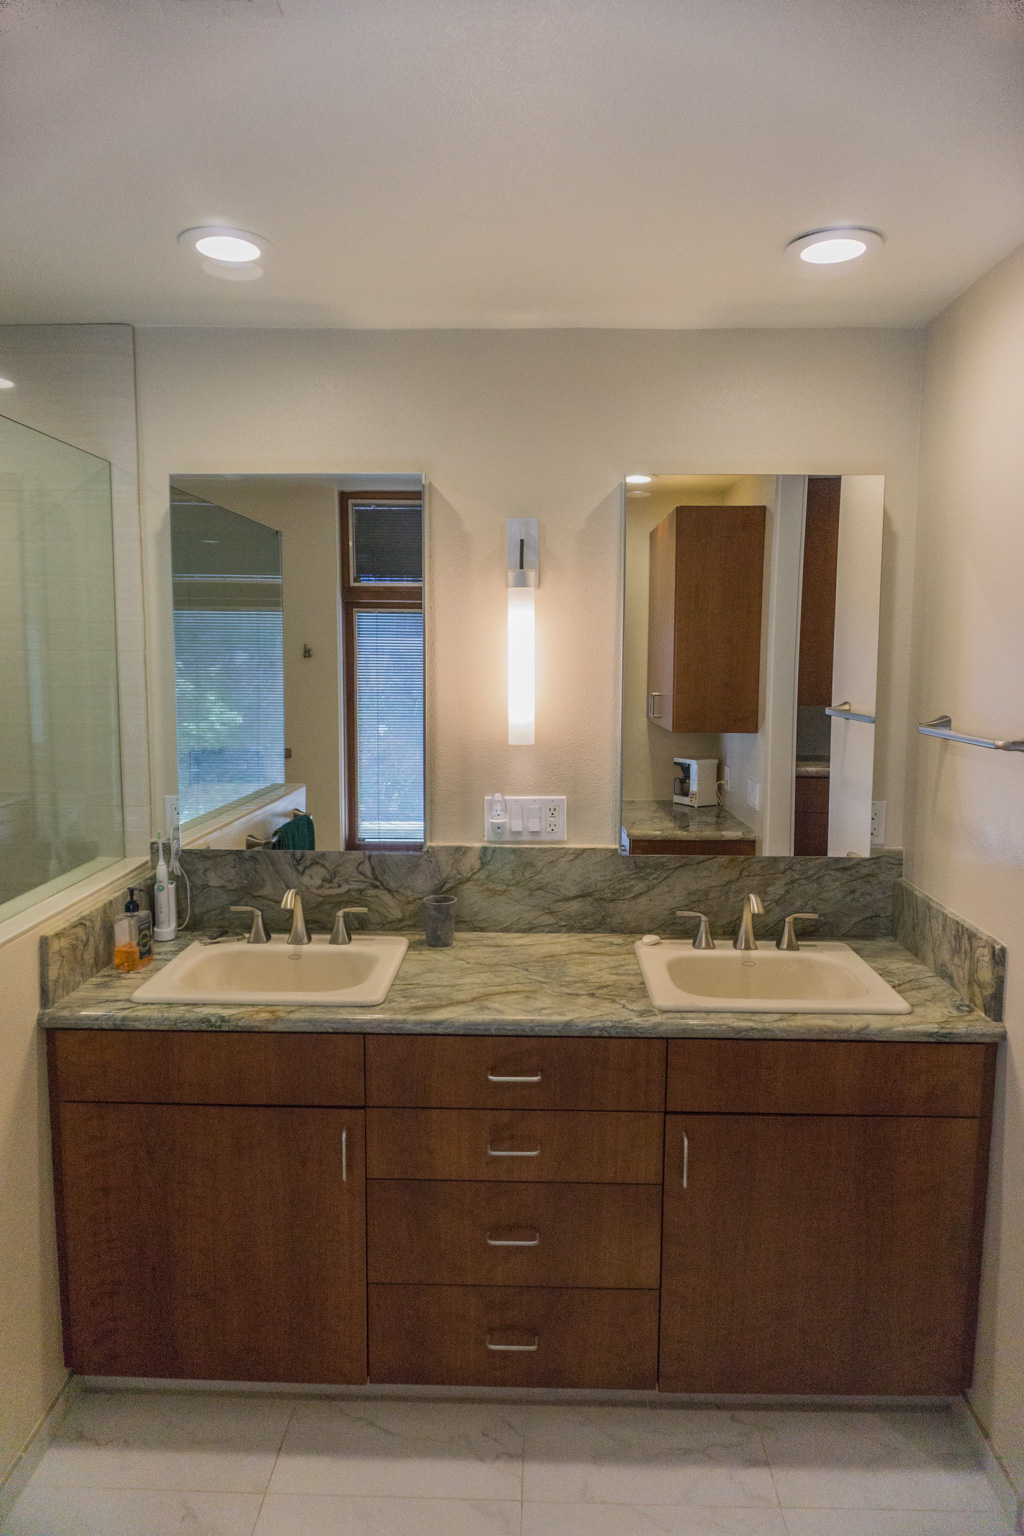 designer kitchen faucets artwork for wood & stone modern master bath - danilo nesovic, ...